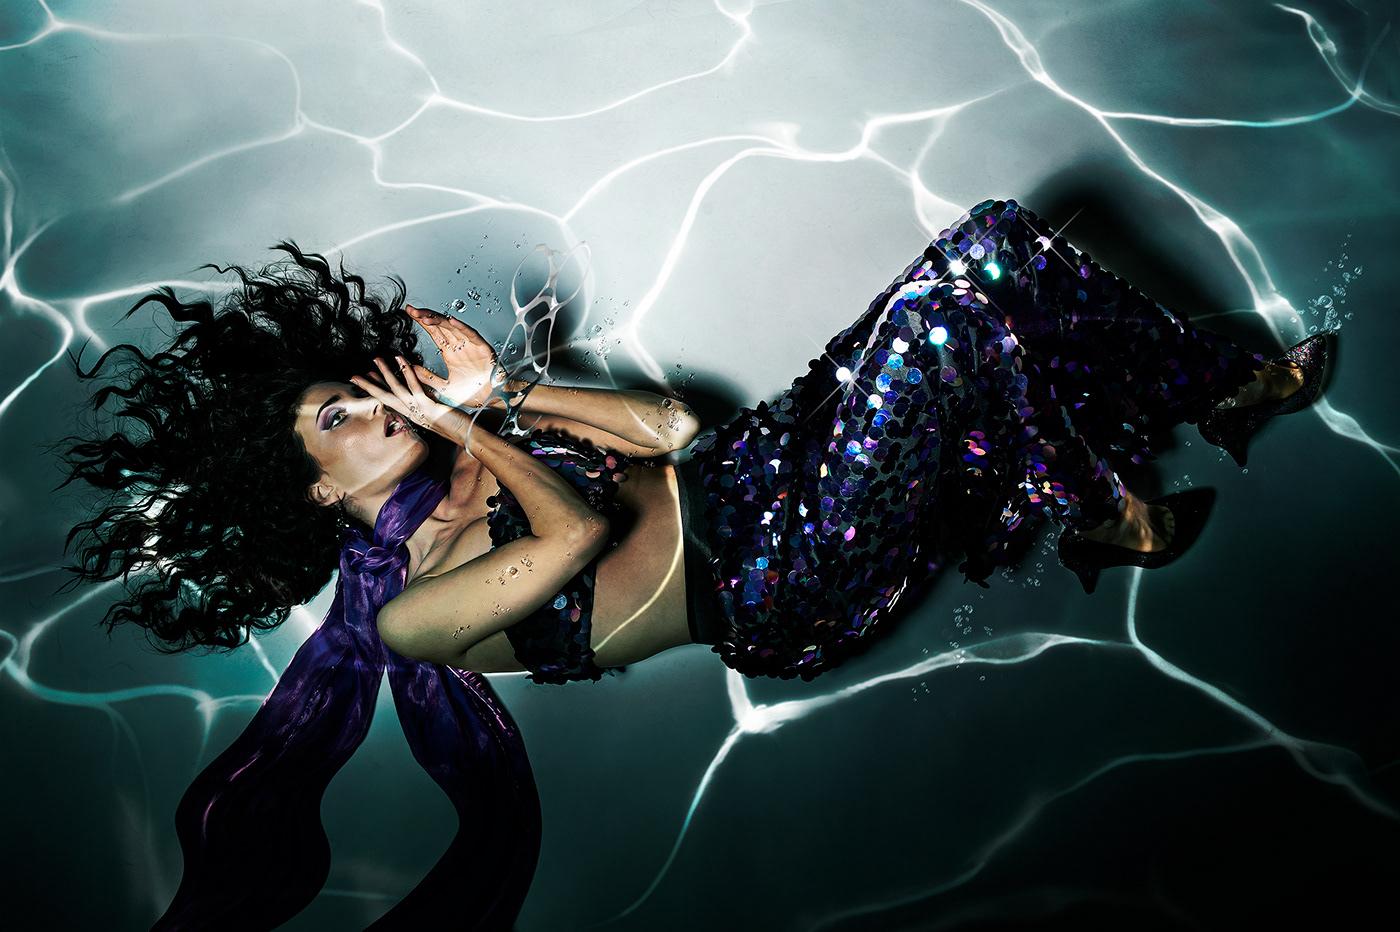 art CreativeDirection editorial Photography  visualart photoshop accessories Style moda artedigitale